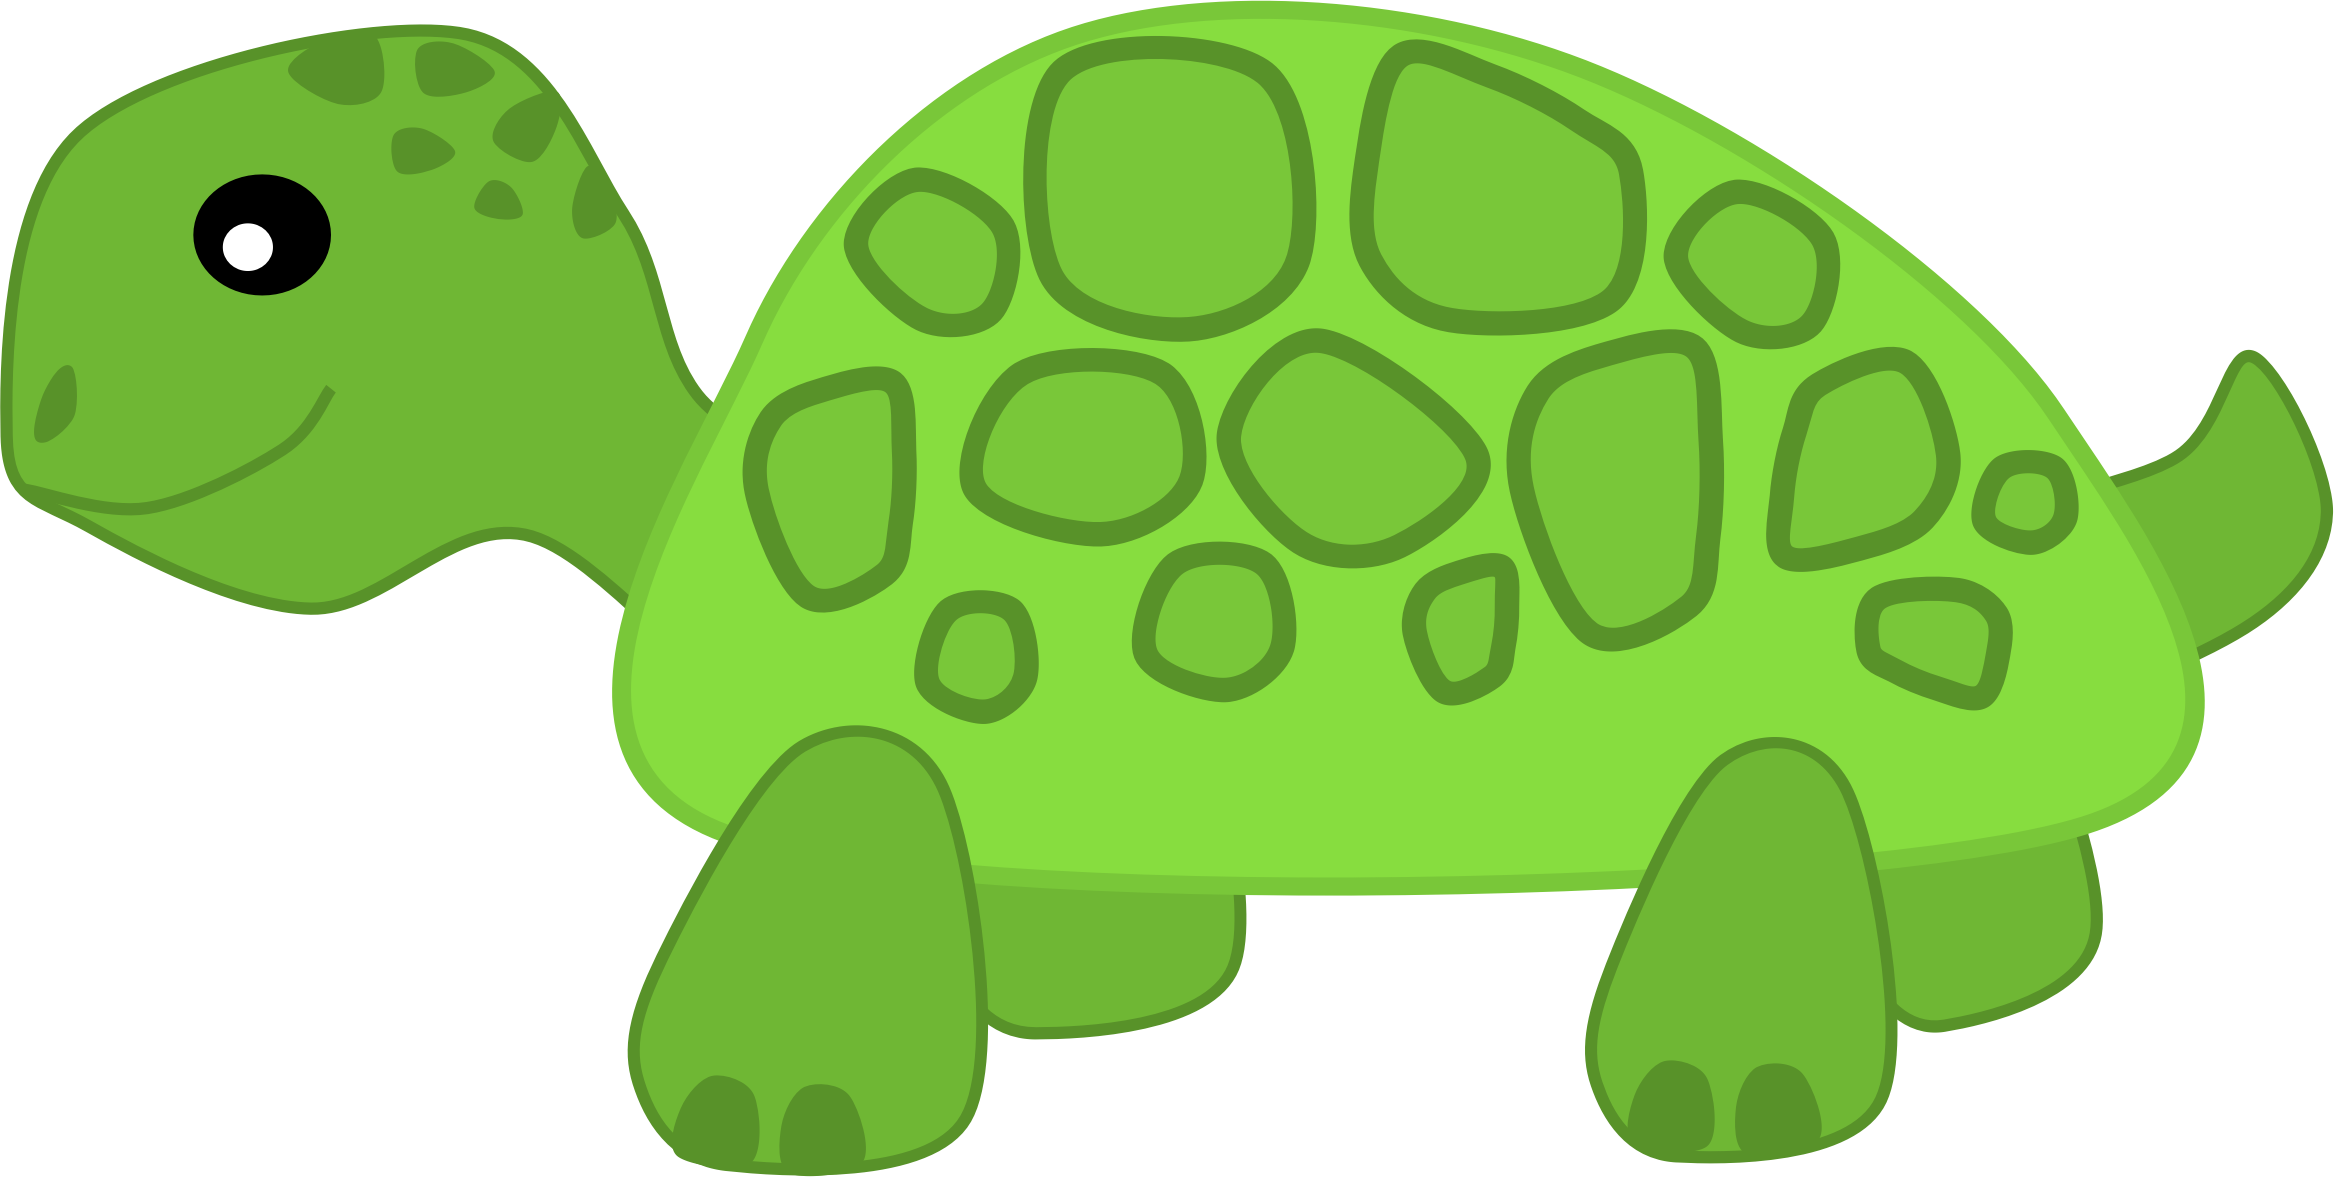 Turtle clipart small #3